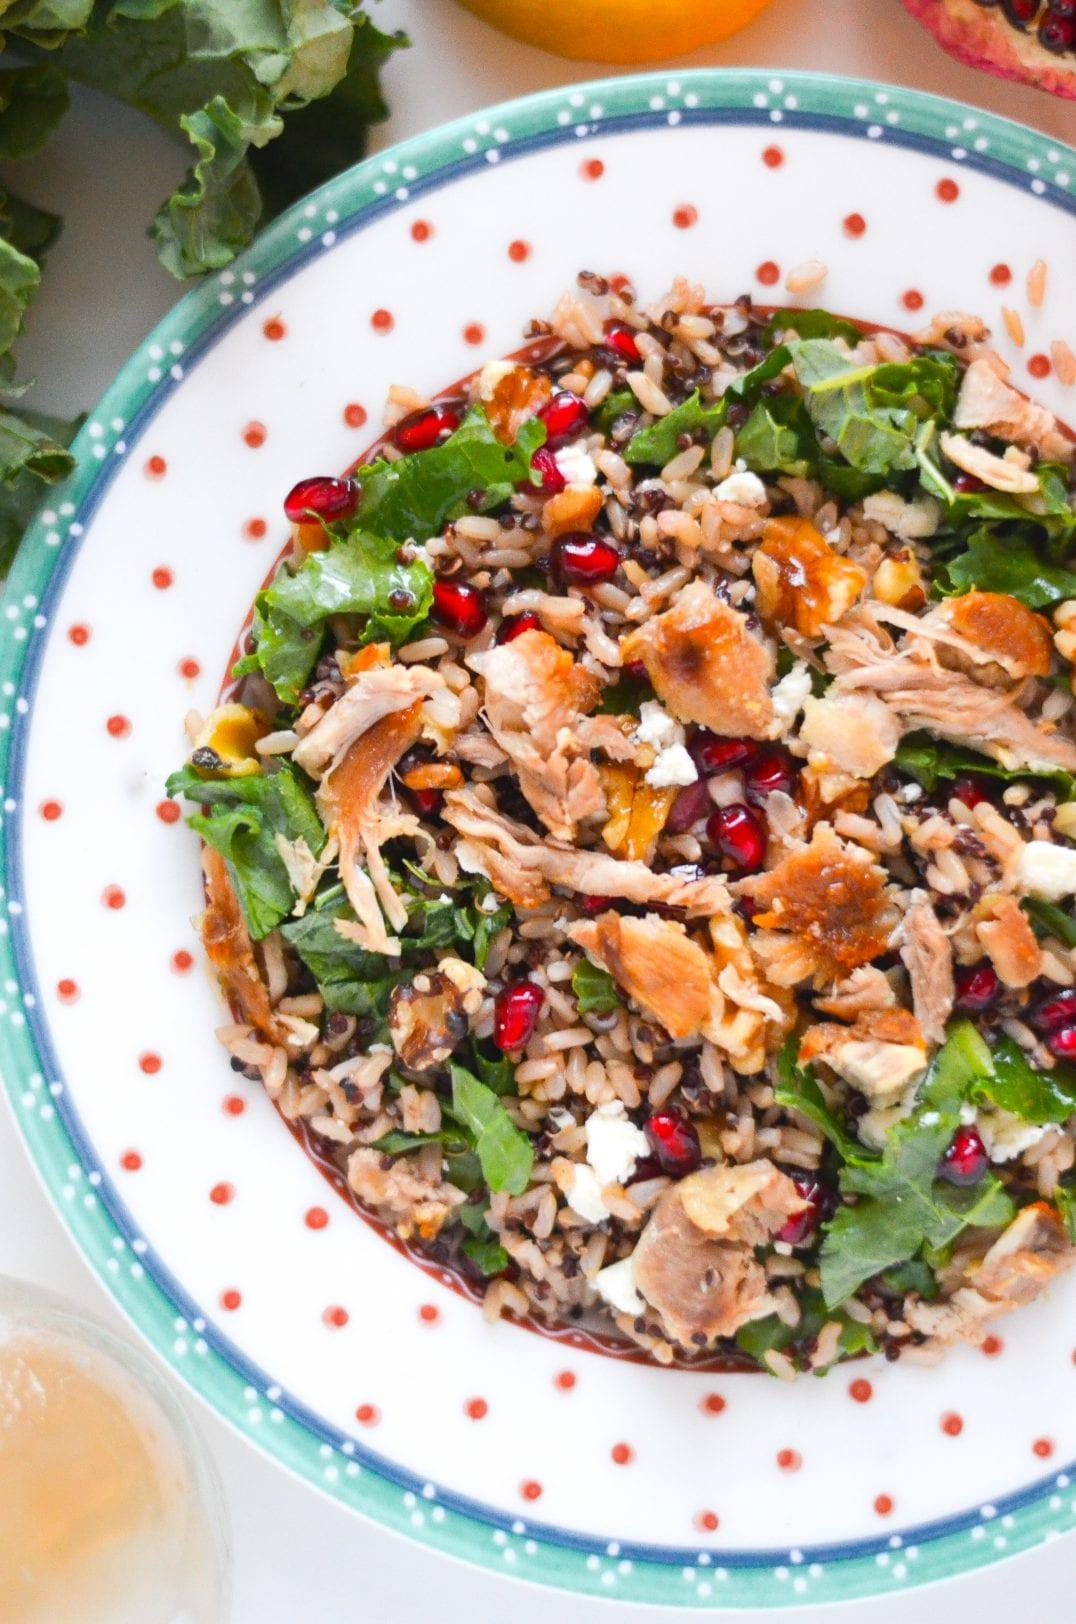 Winter Brown Rice and Quinoa Salad with Lemon Maple Vinaigrette